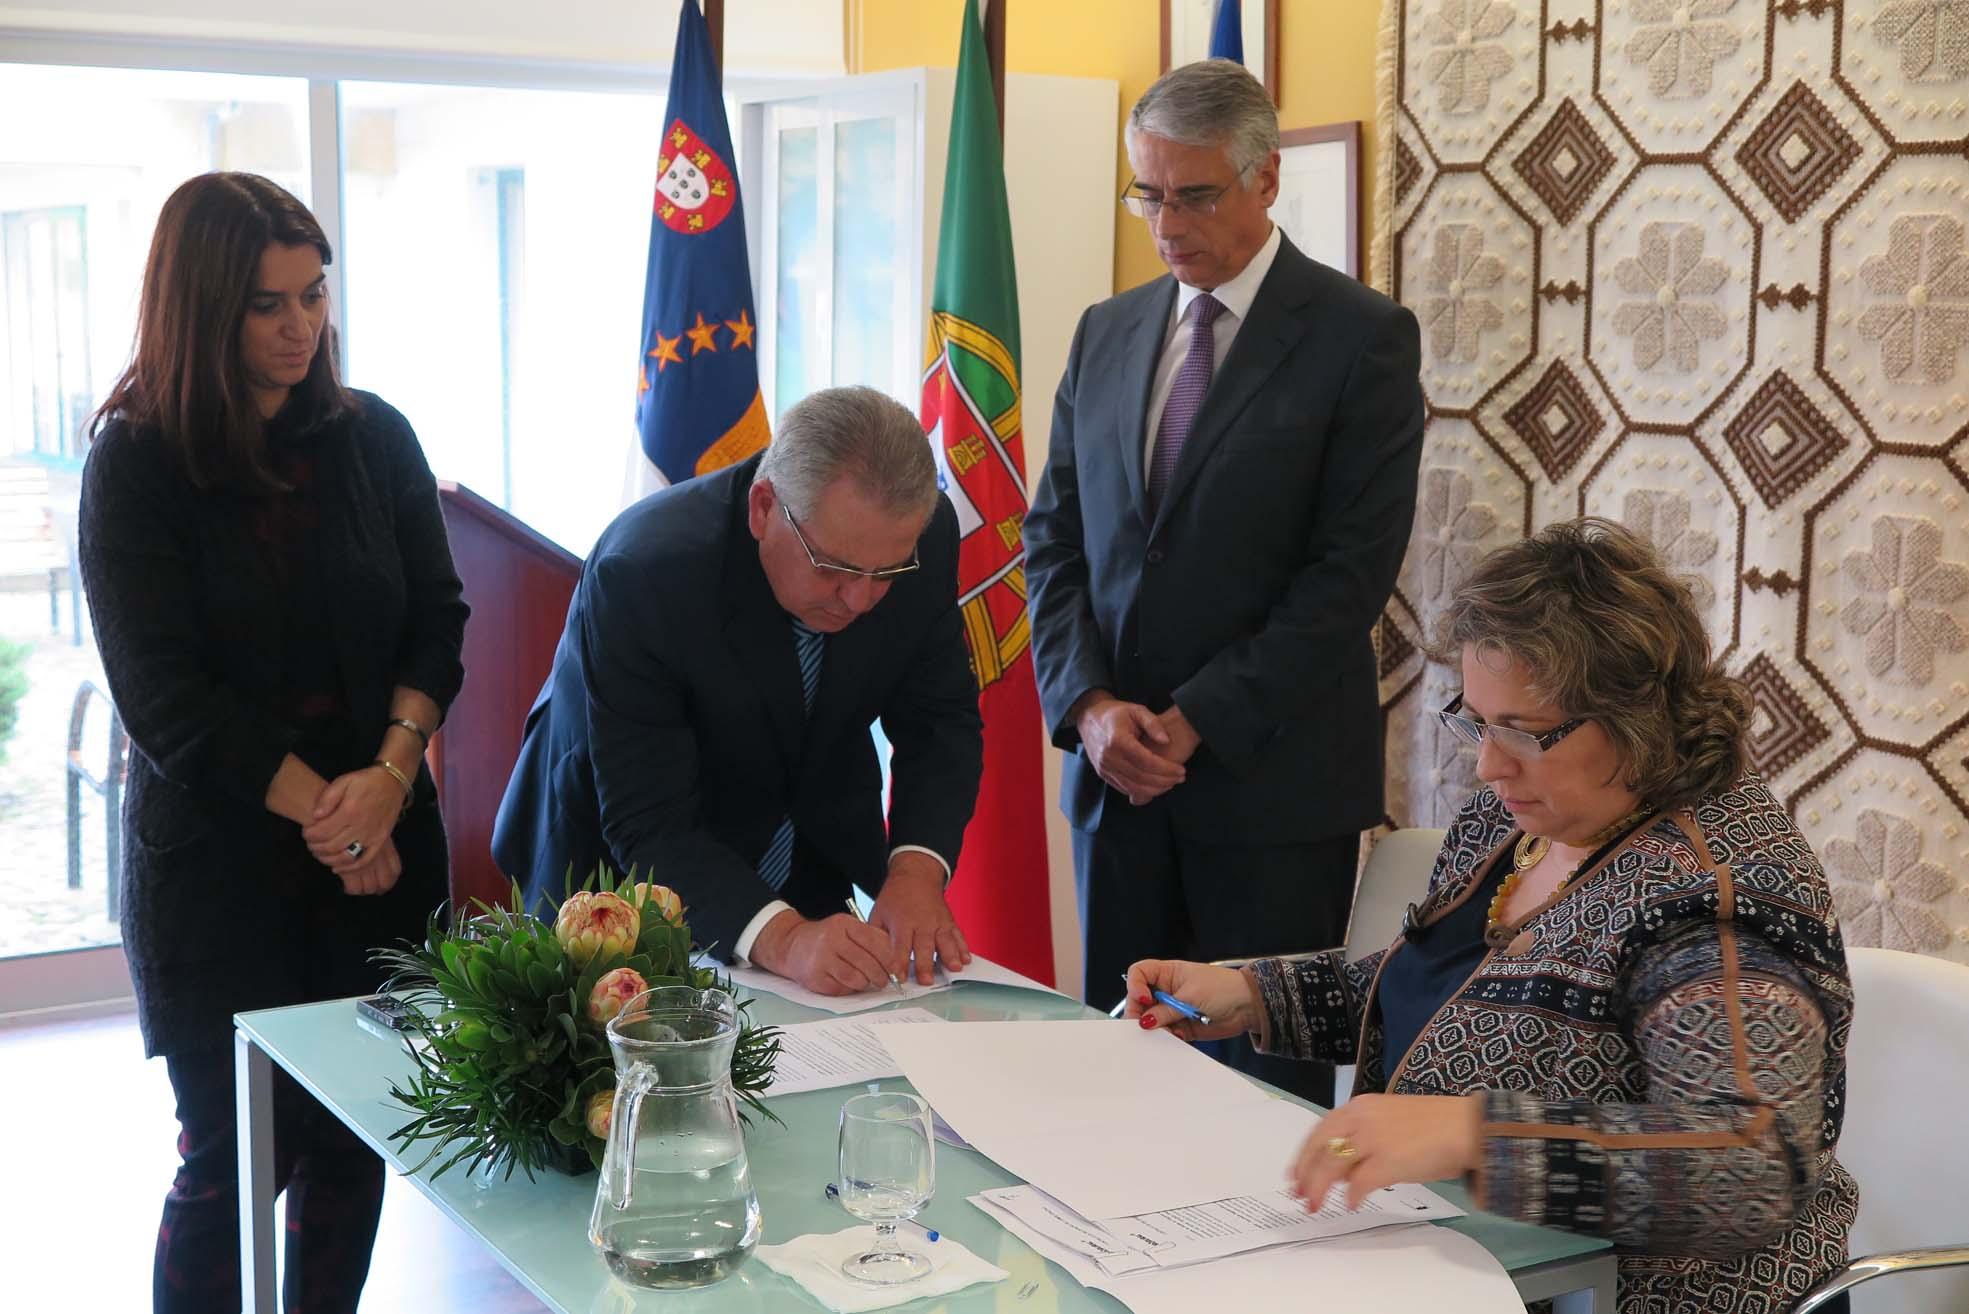 Luís Neto Viveiros destaca que, pela primeira vez, o LEADER abrange todas as freguesias dos Açores